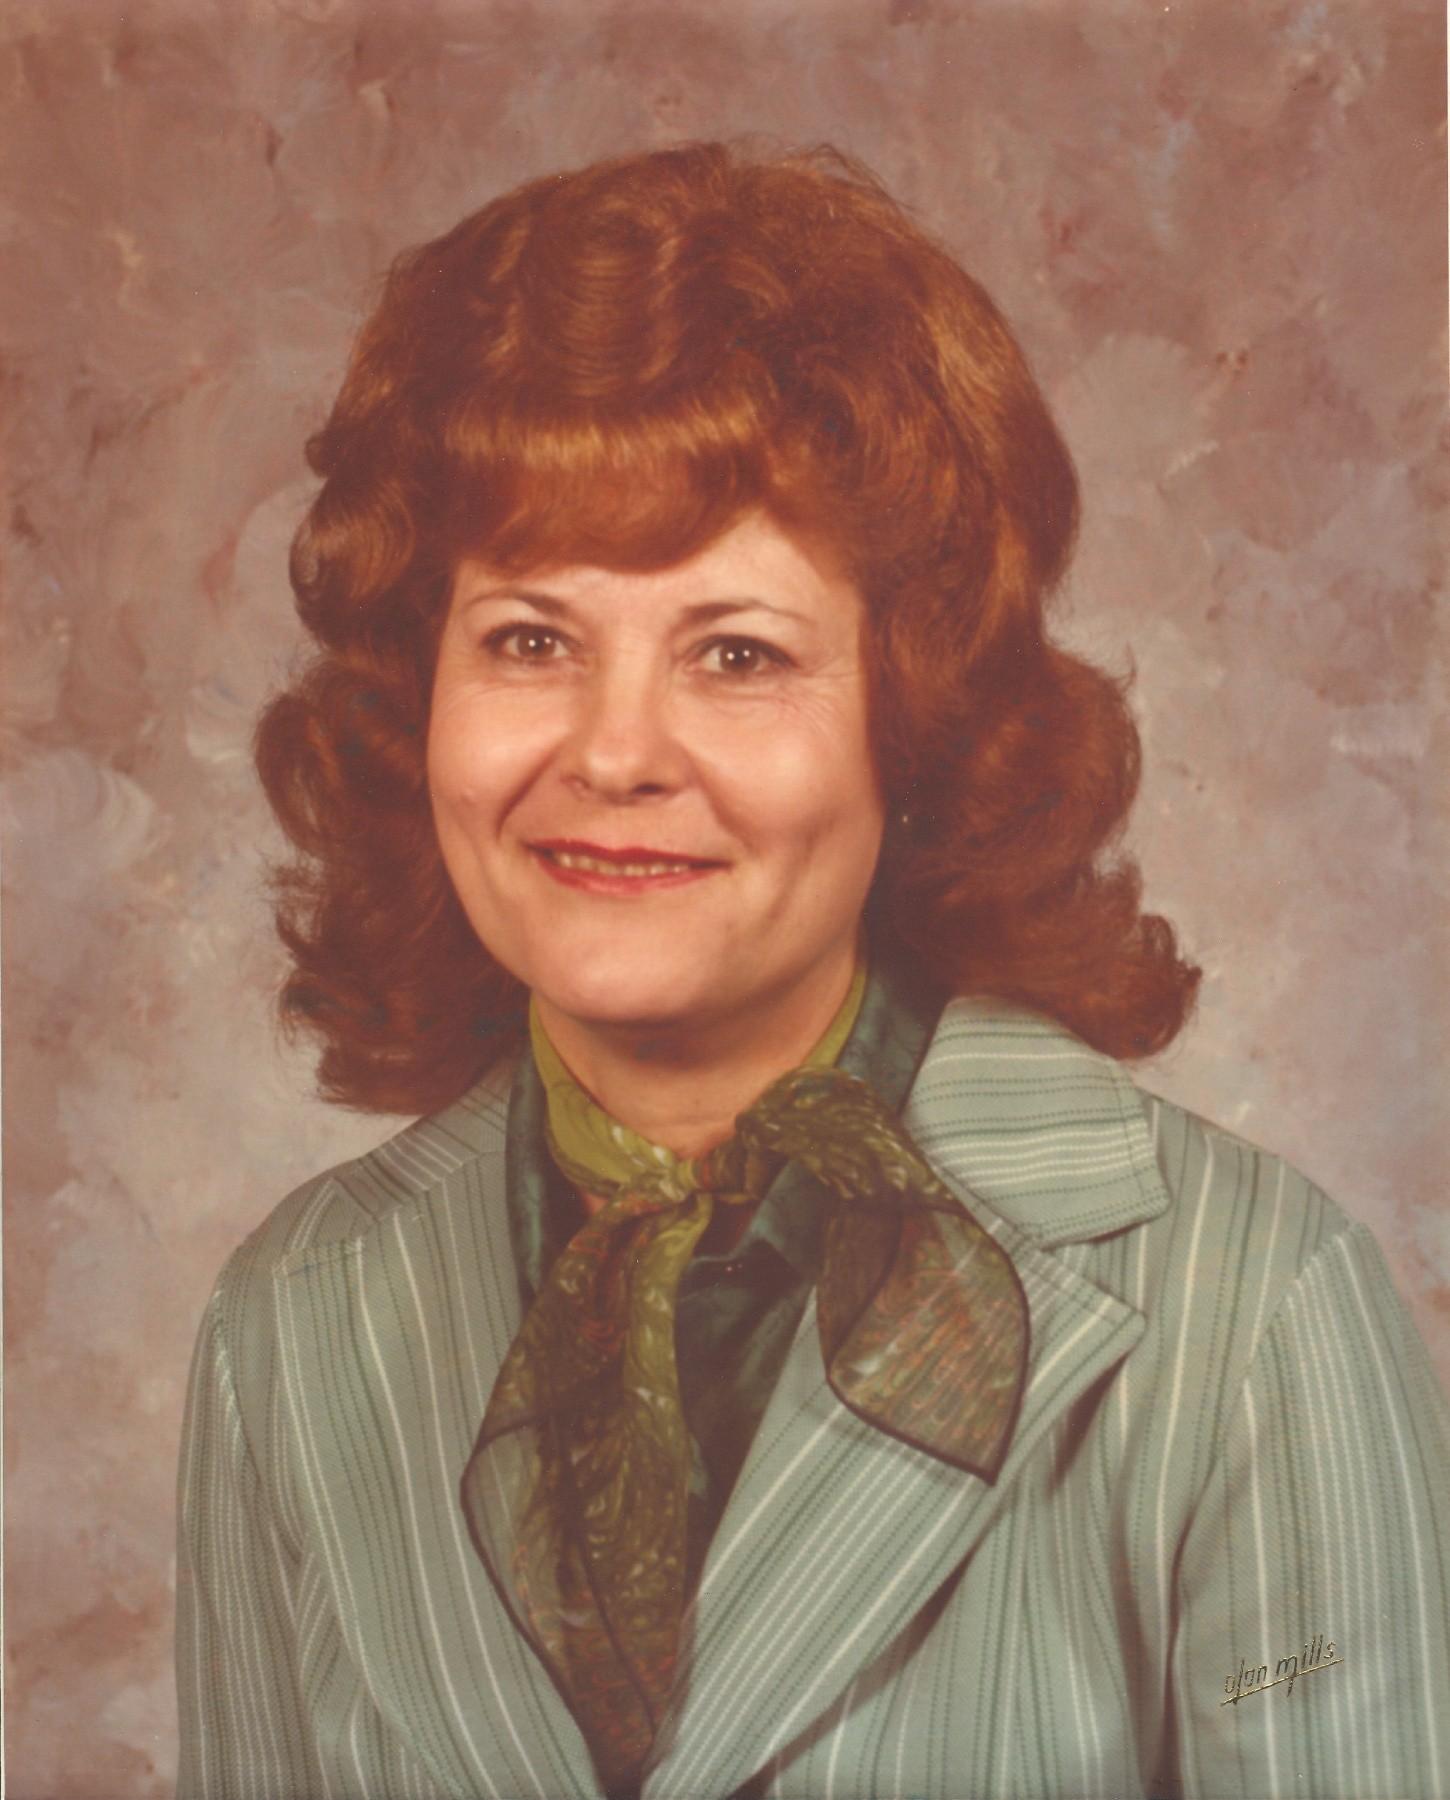 Shermaine Santiago (b. 1980) images